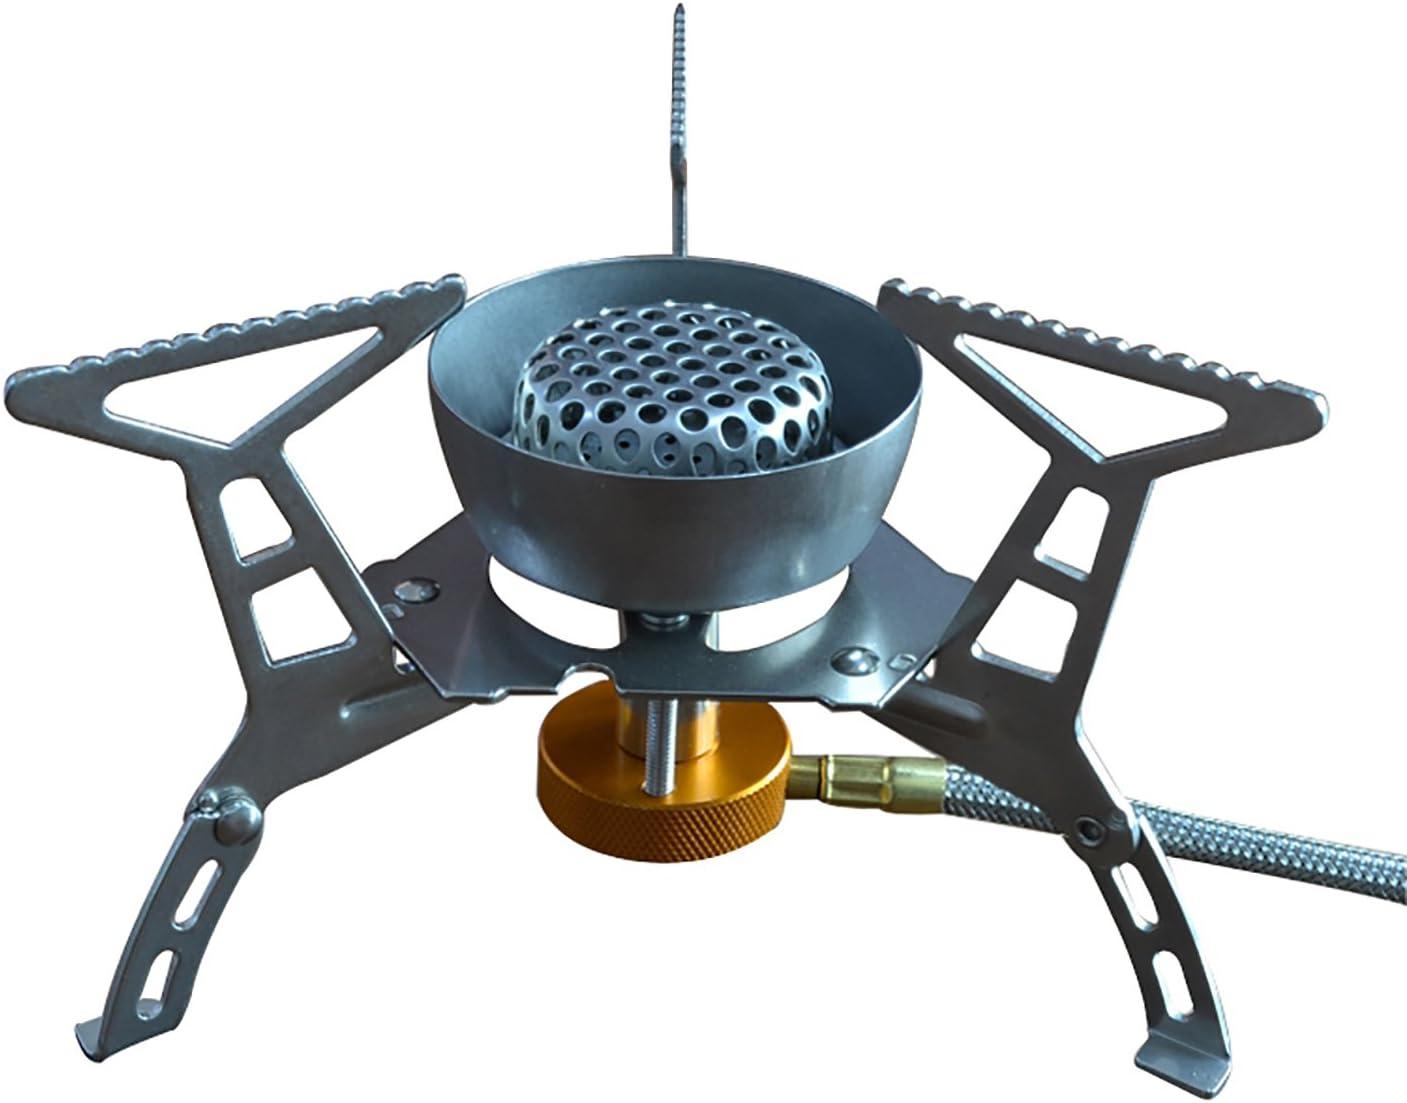 DESERT & FOX Mini Estufa de Camping Ultraligera, aleación de Titanio, Plegable, automática, para picnics, cocinas, Camping, Senderismo